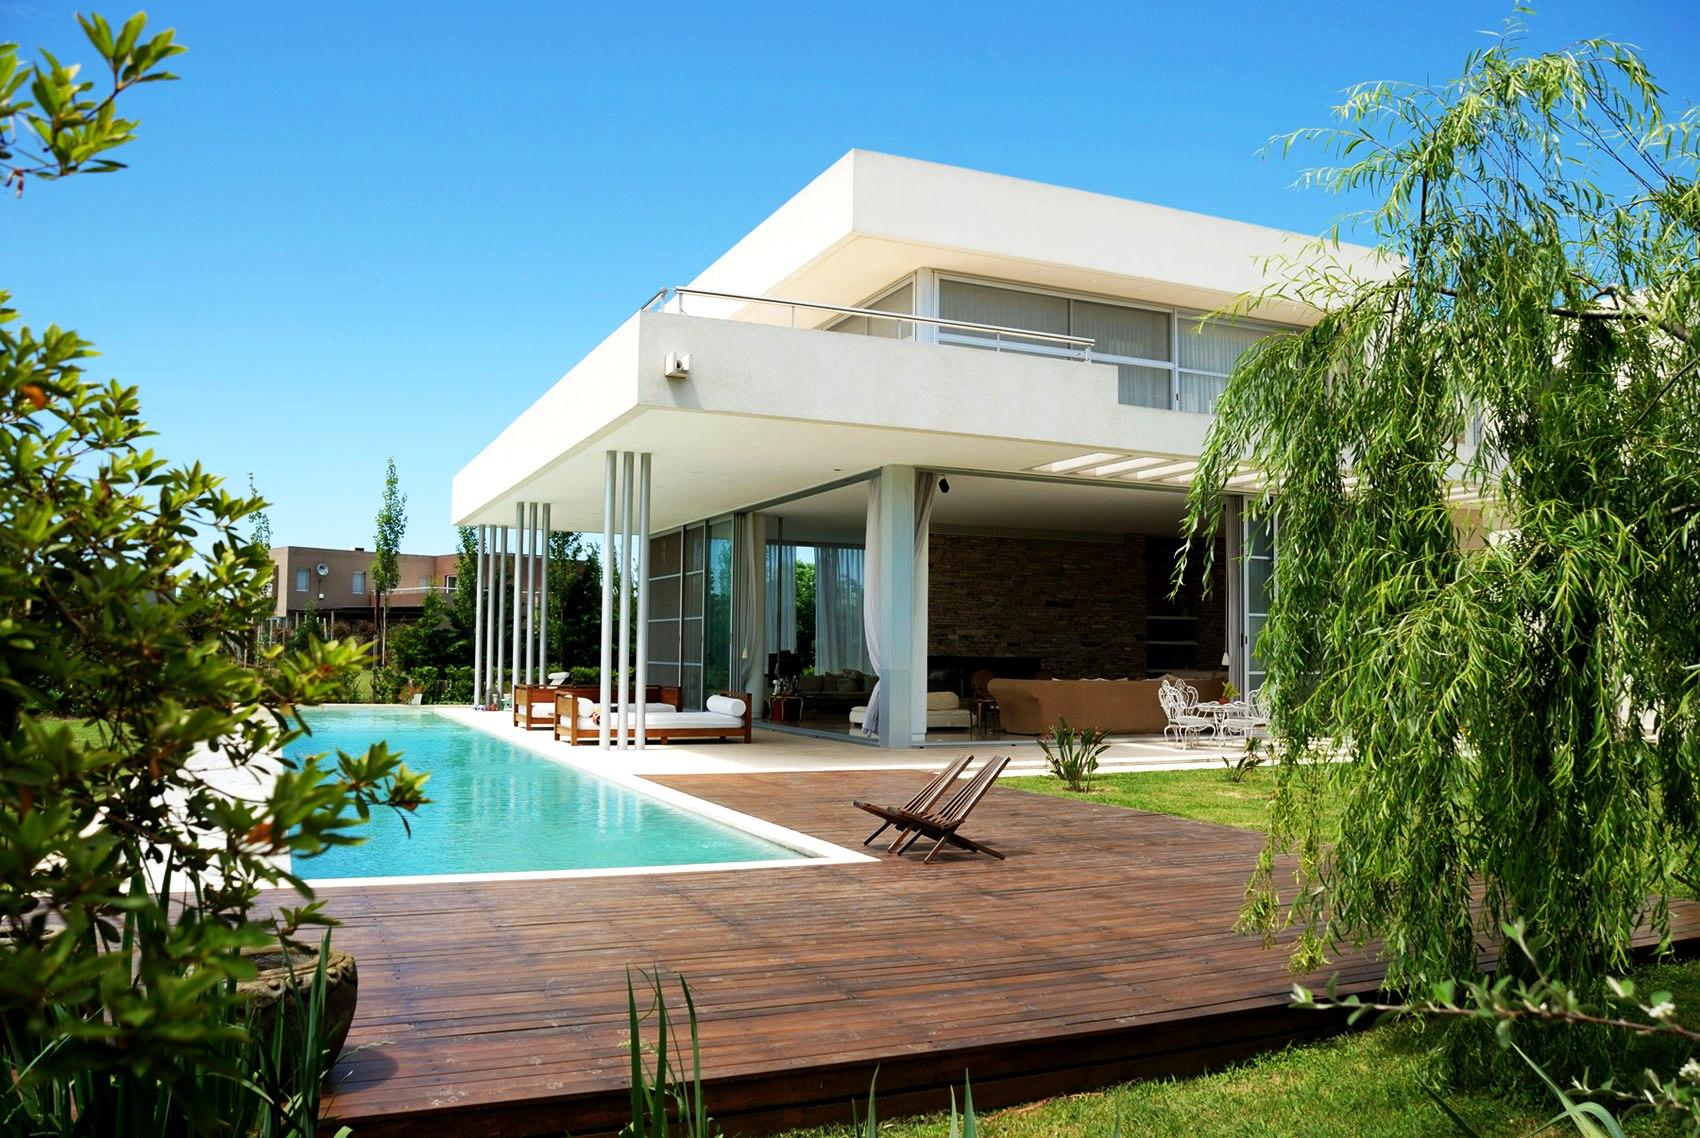 Backyard Pool Landscaping Ideas | HomesFeed on Modern Backyard Ideas With Pool id=75455